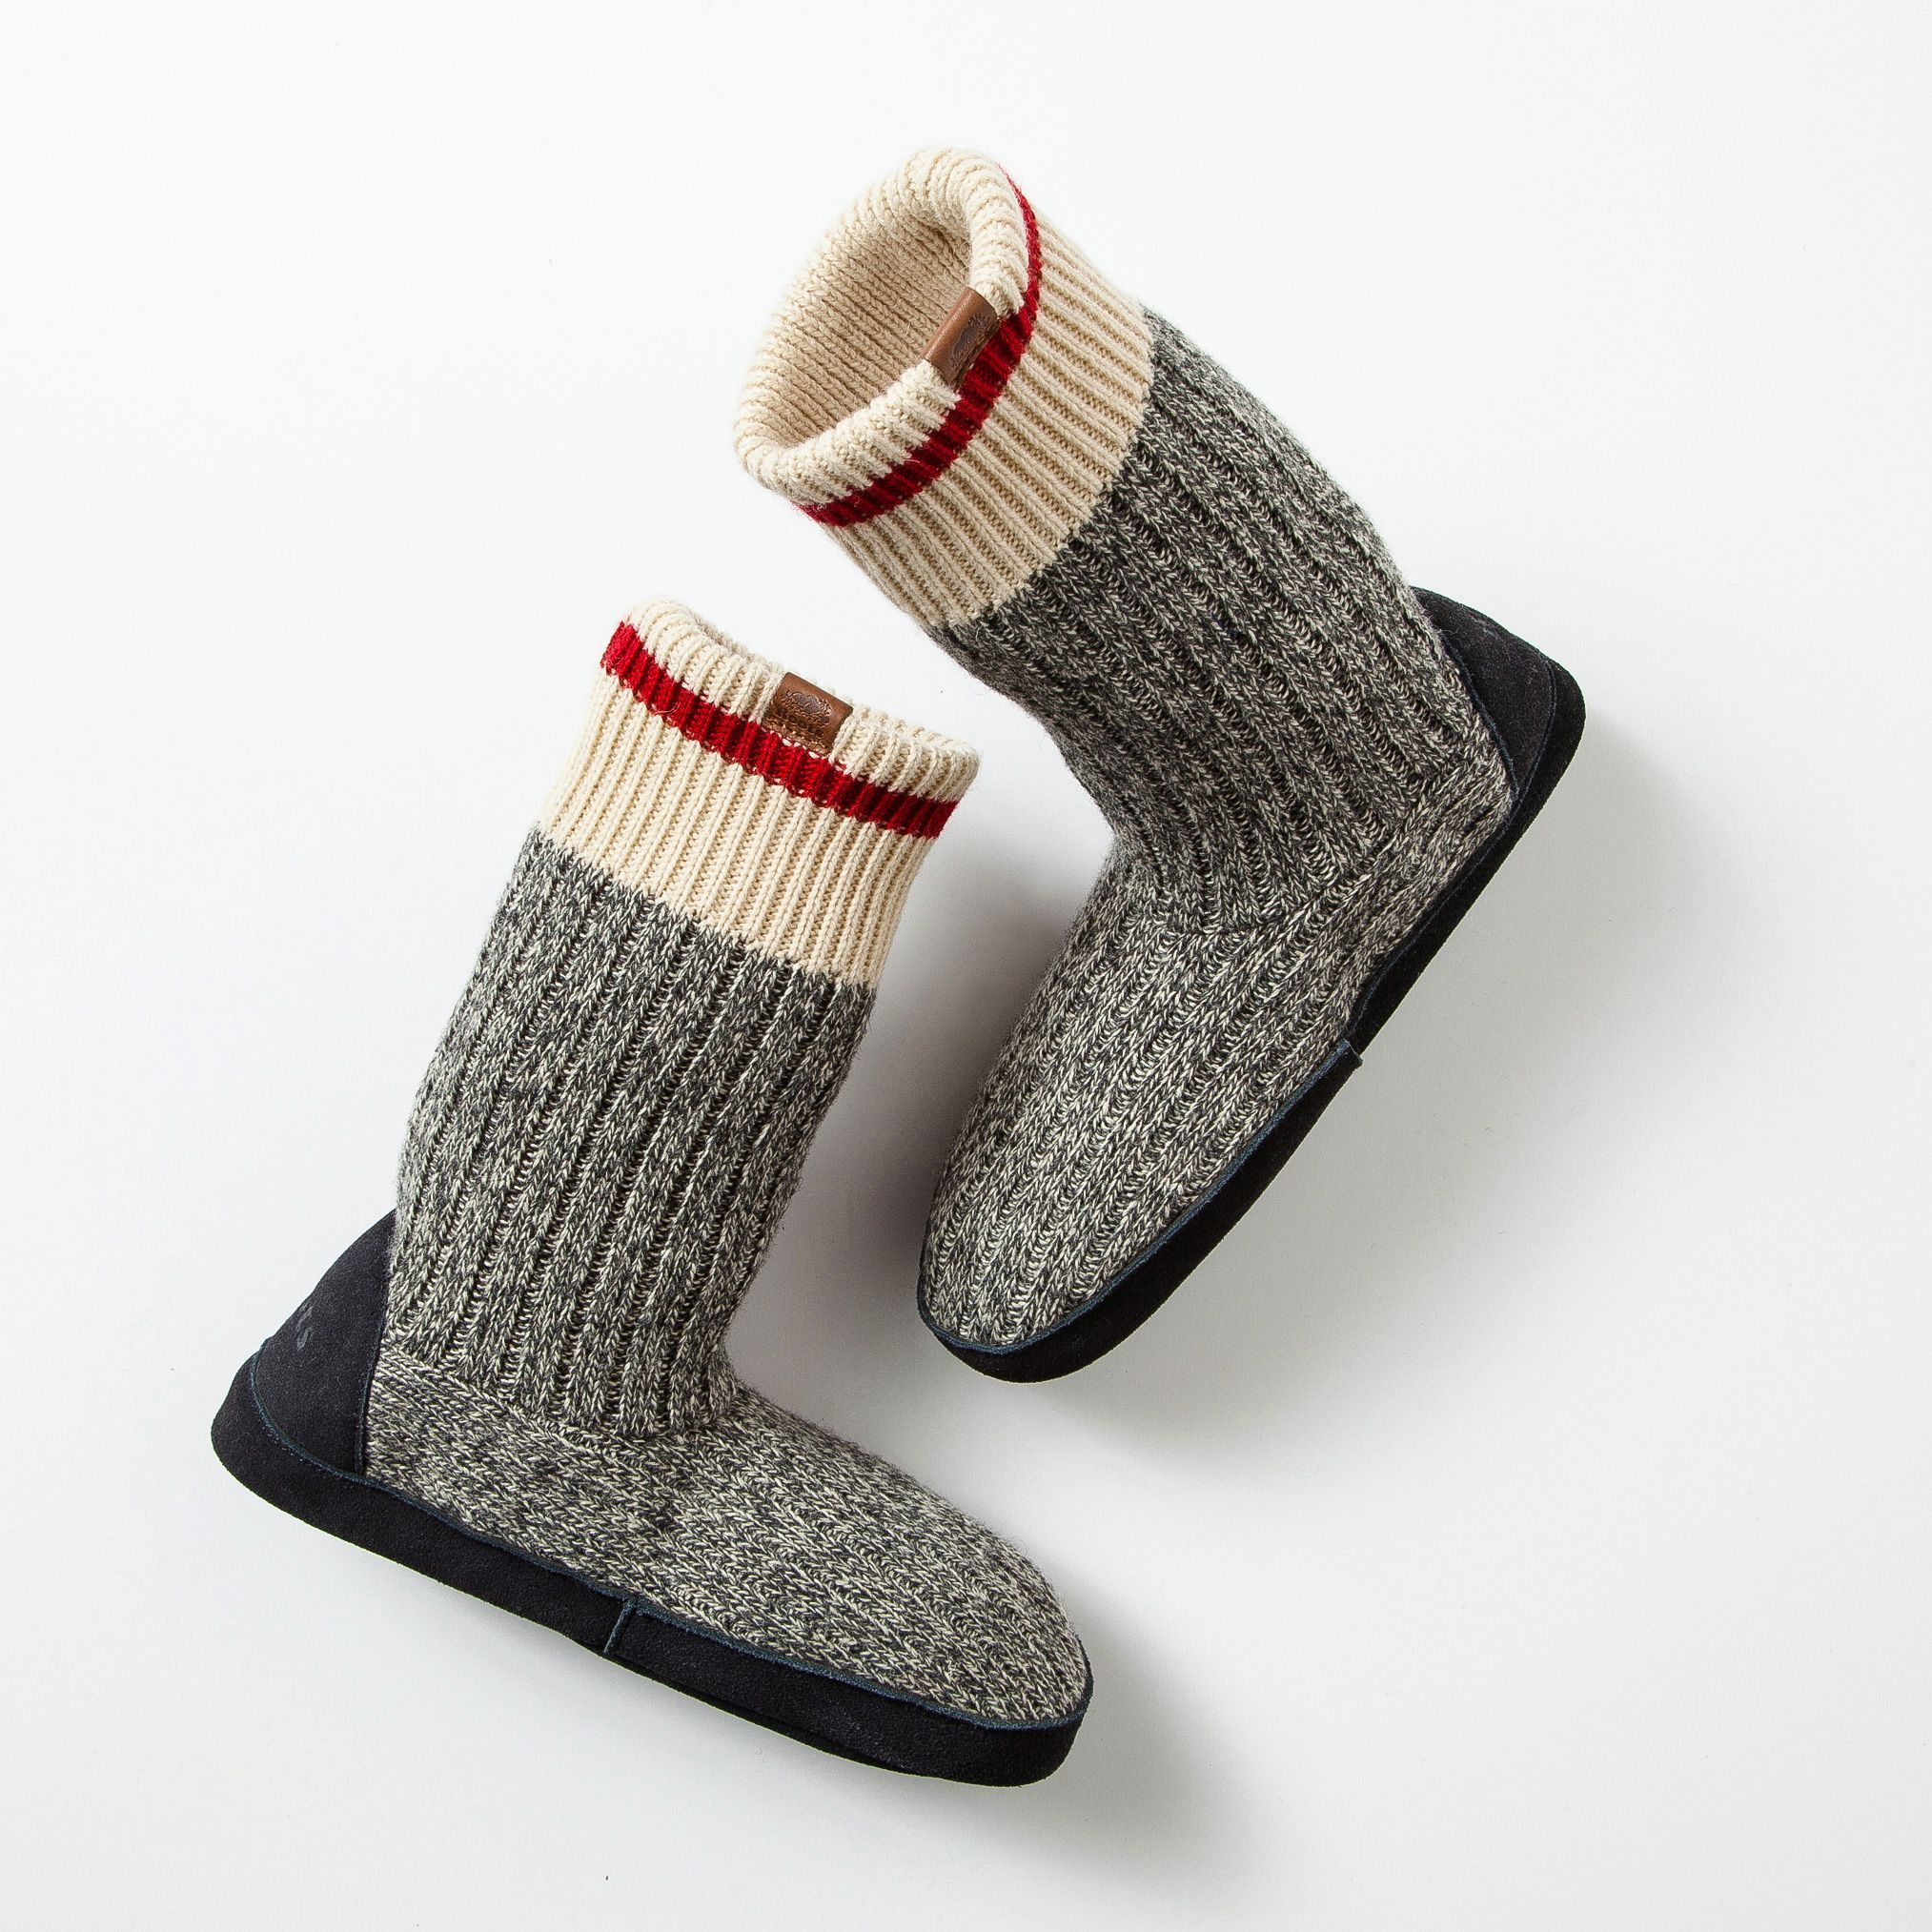 Womens Cabin Sock Slippers | Roots Socks For Women - On Sale $ 29.00 | Wish List | Pinterest ...